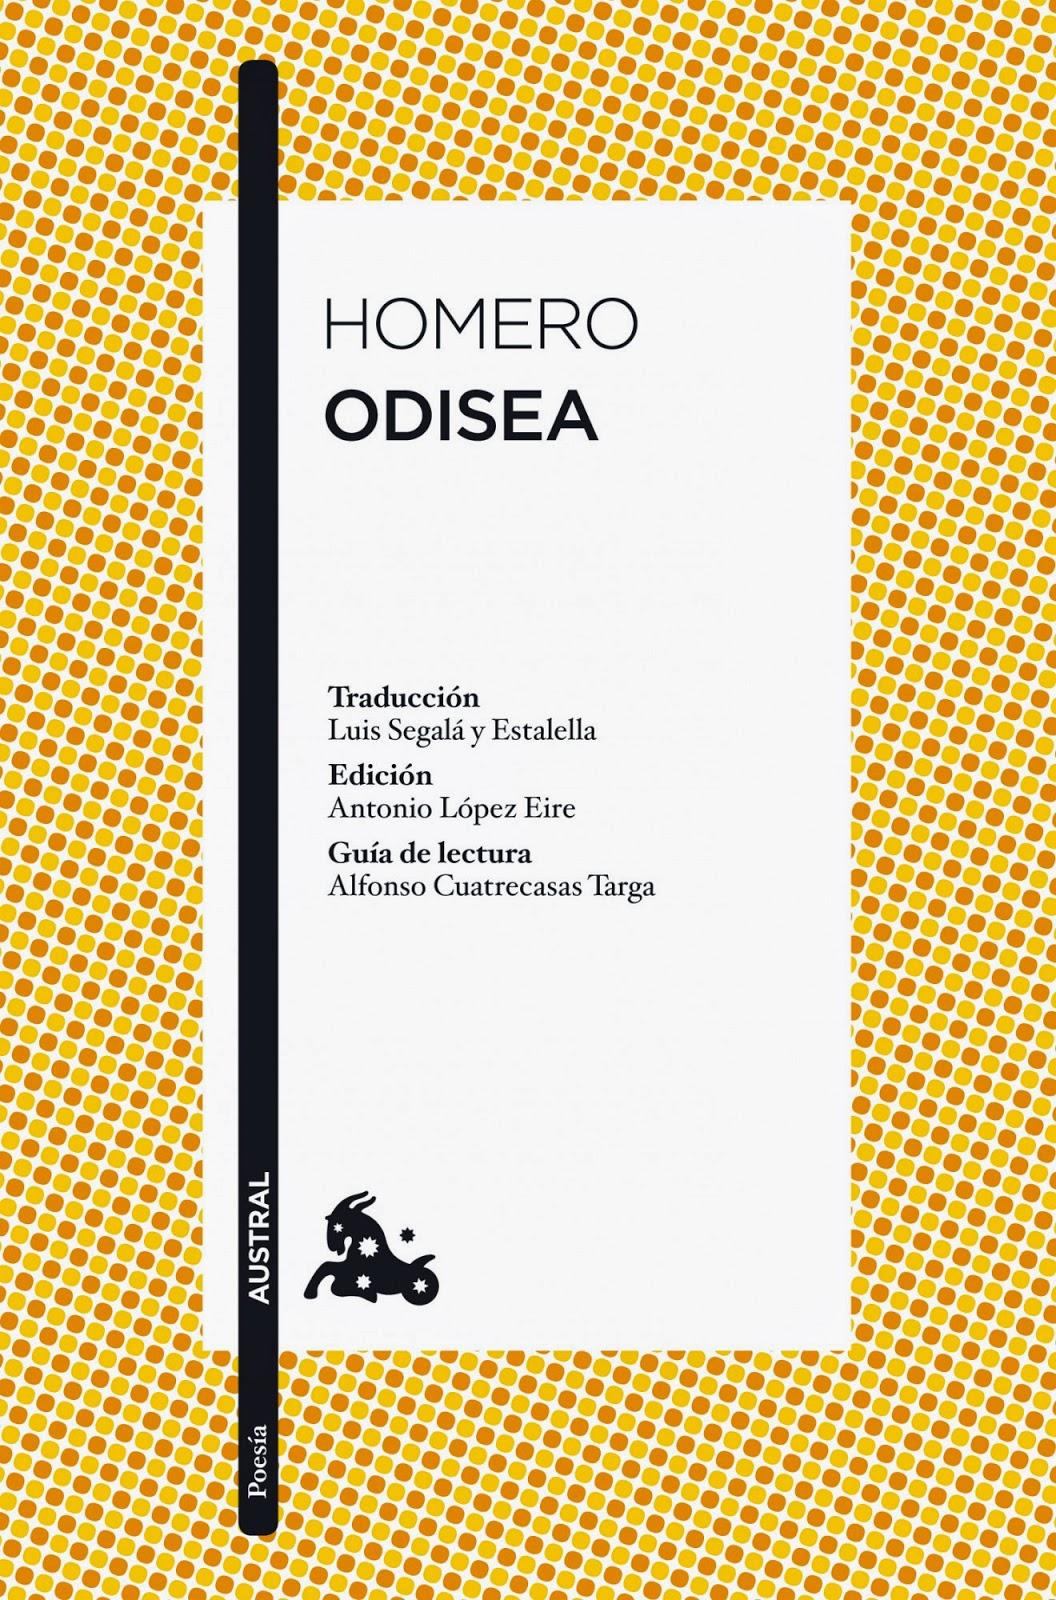 http://www.planetadelibros.com/odisea-libro-47909.html